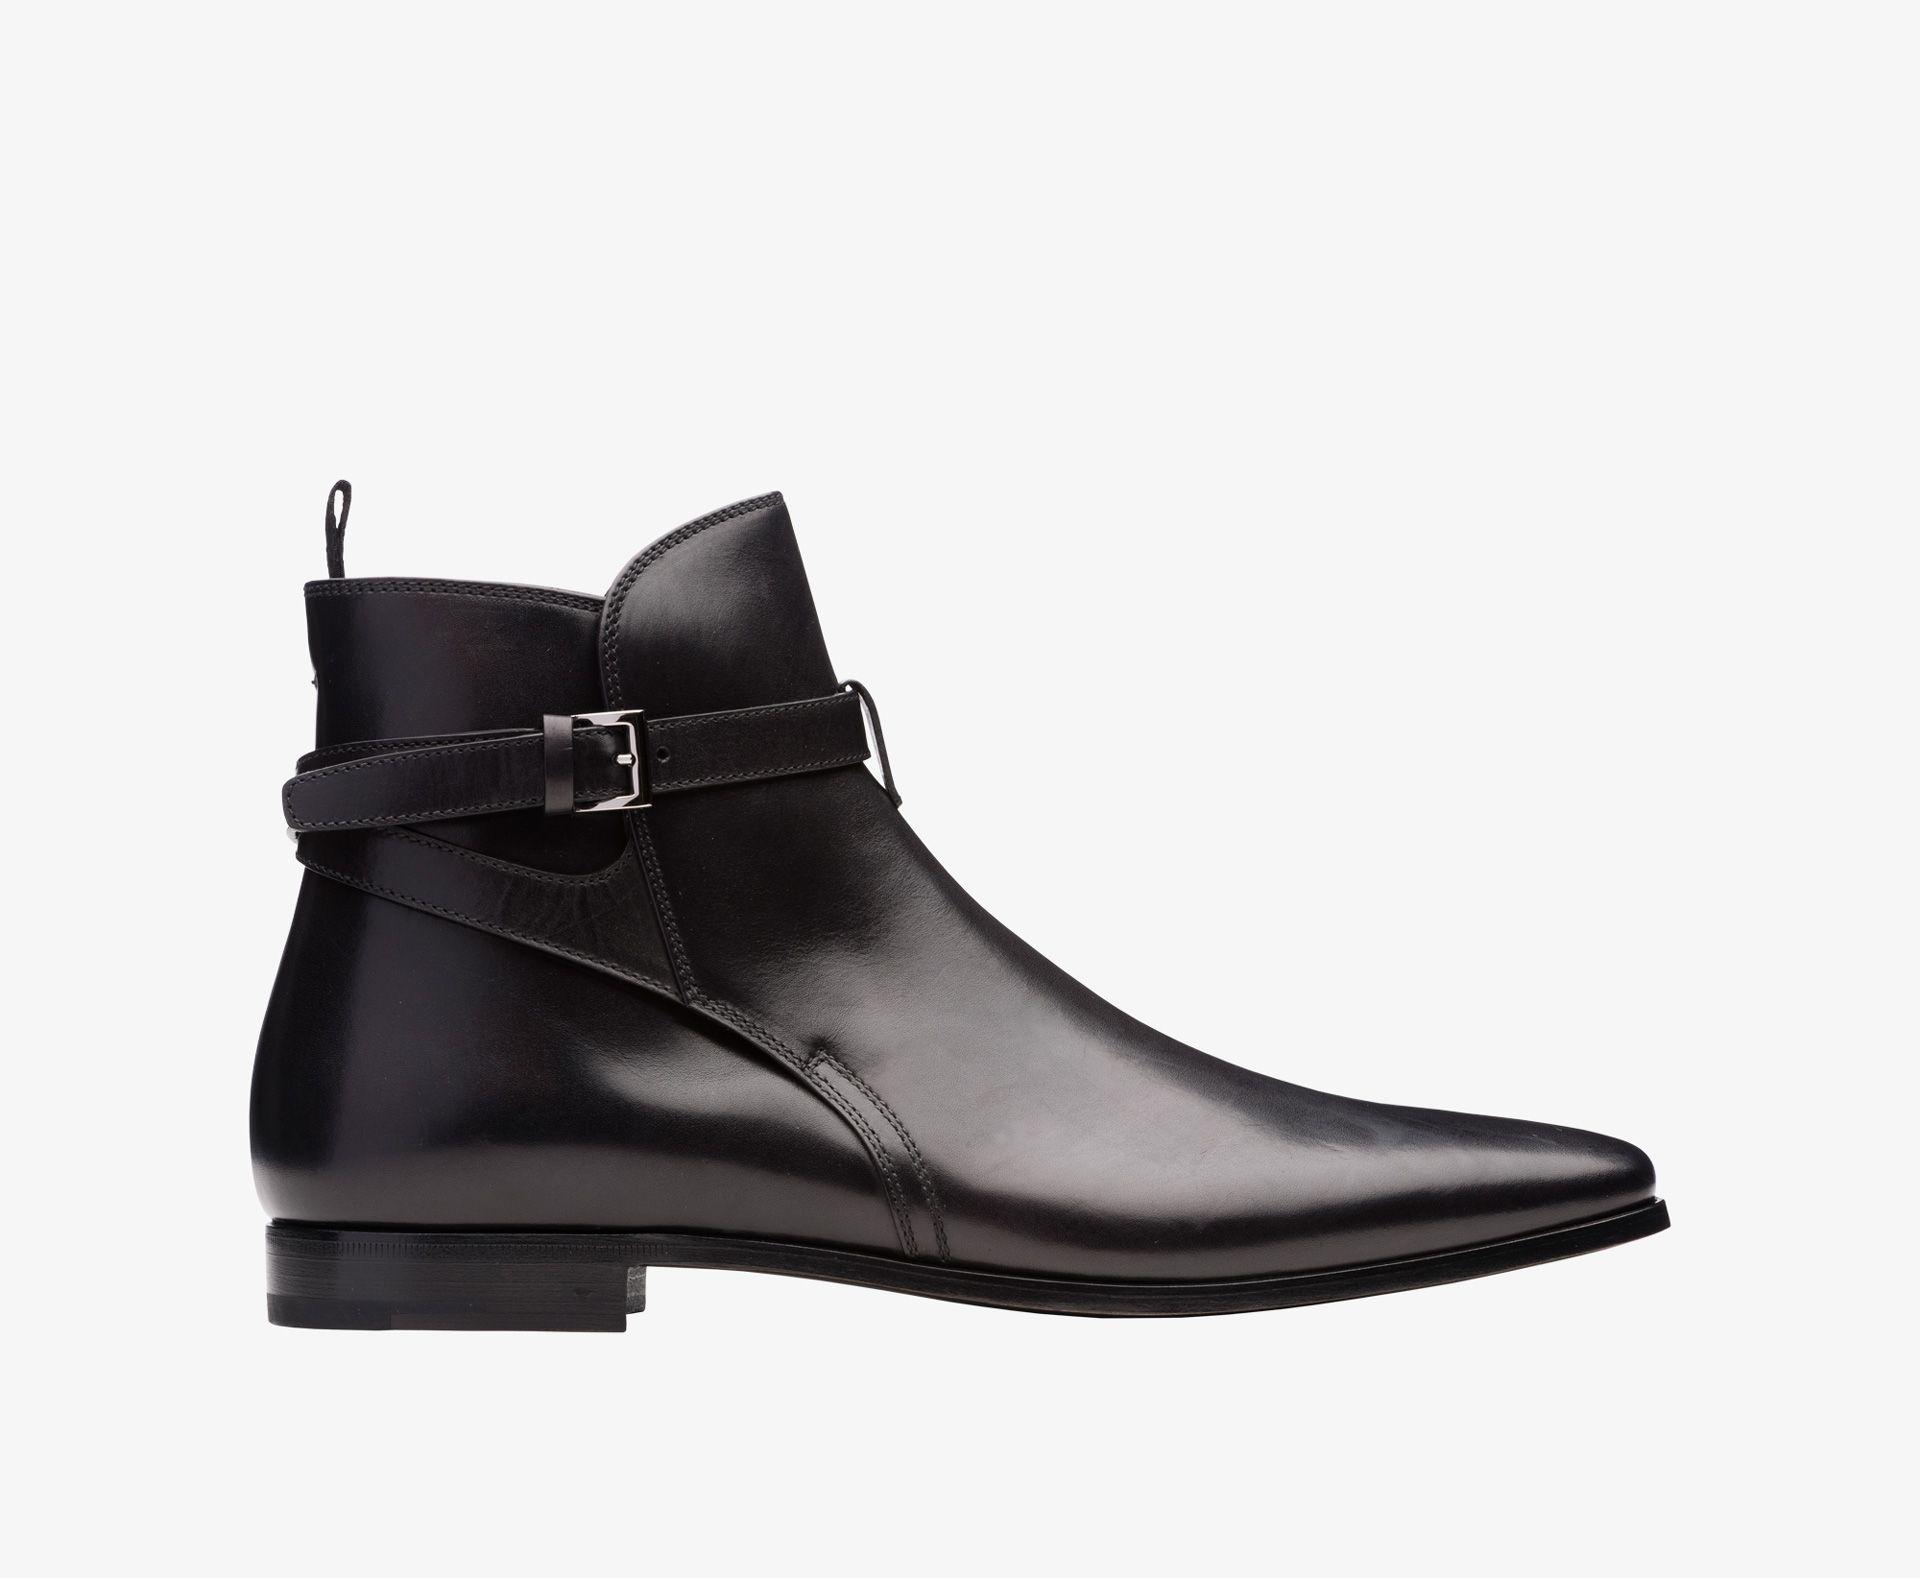 loafer detail ankle boots - Black Prada LH72uzngSy